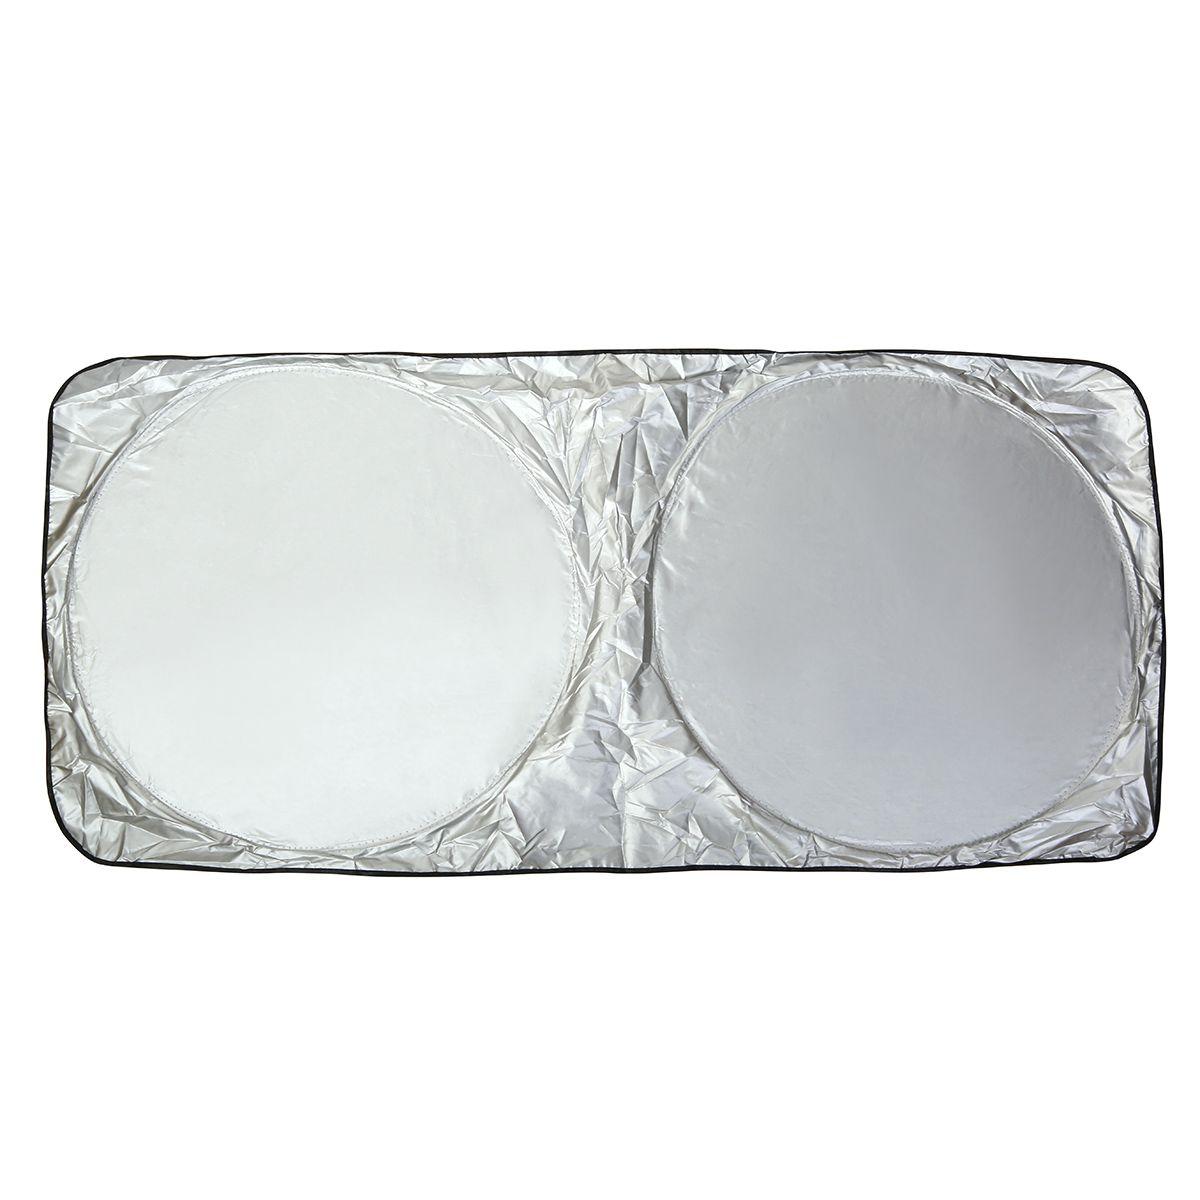 Universal Foldable Sun Shade Car Front Rear Window Sunshade Auto Windshield Block Cover Visor Solar Protection Film